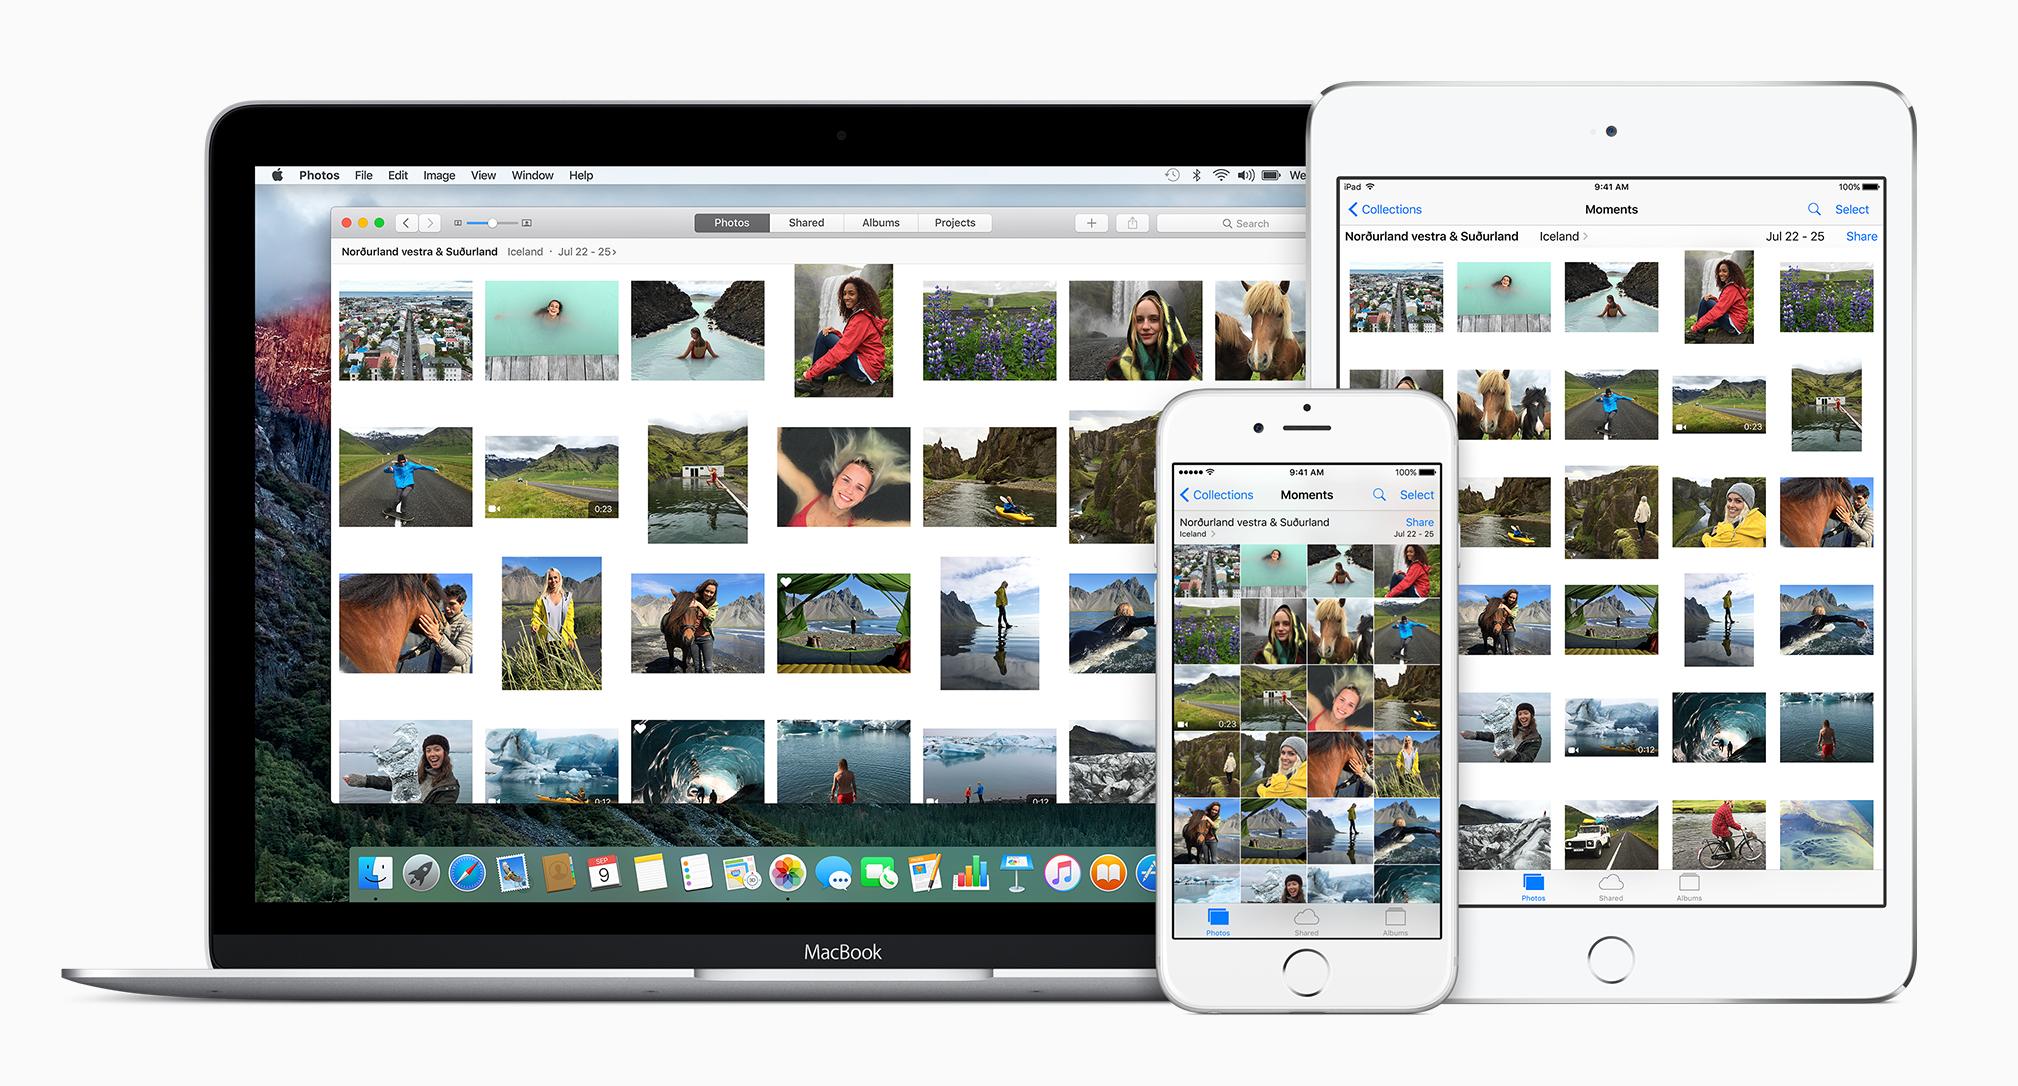 Understanding Apple's iCloud Photo Library